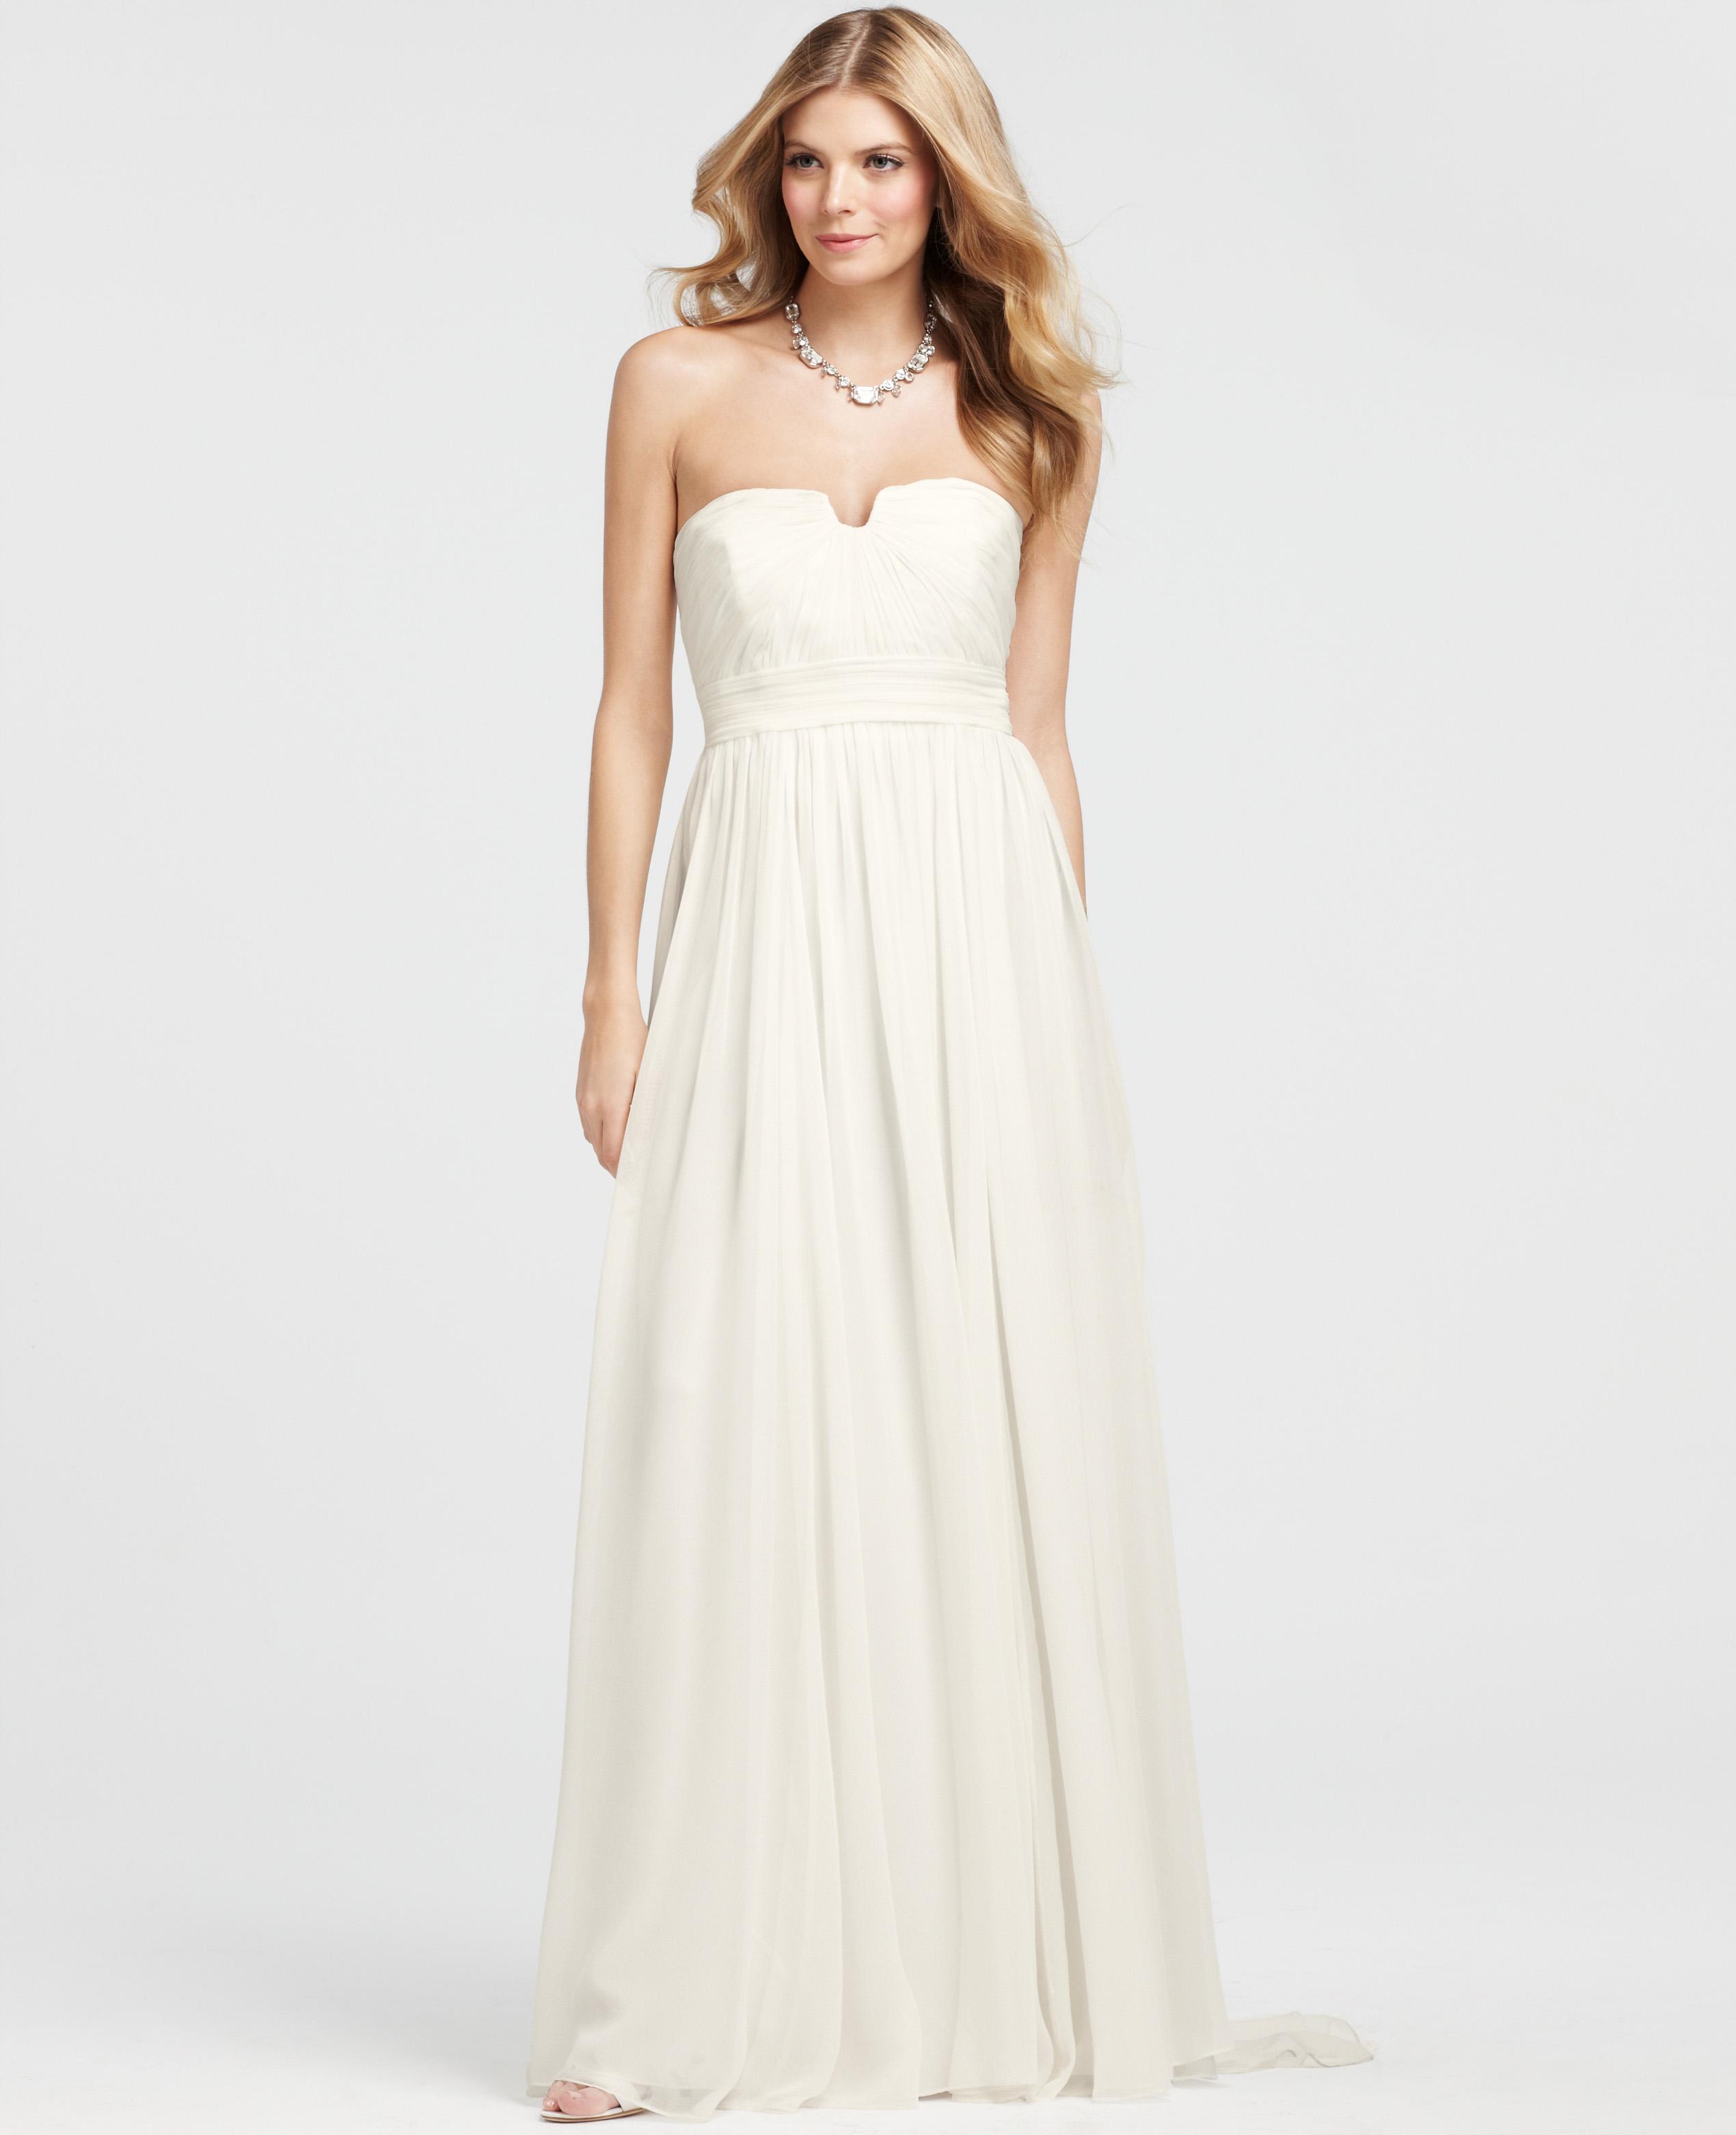 Vintage Wedding Dresses Canada: Ann Taylor Vintage Silk Strapless Wedding Dress In White